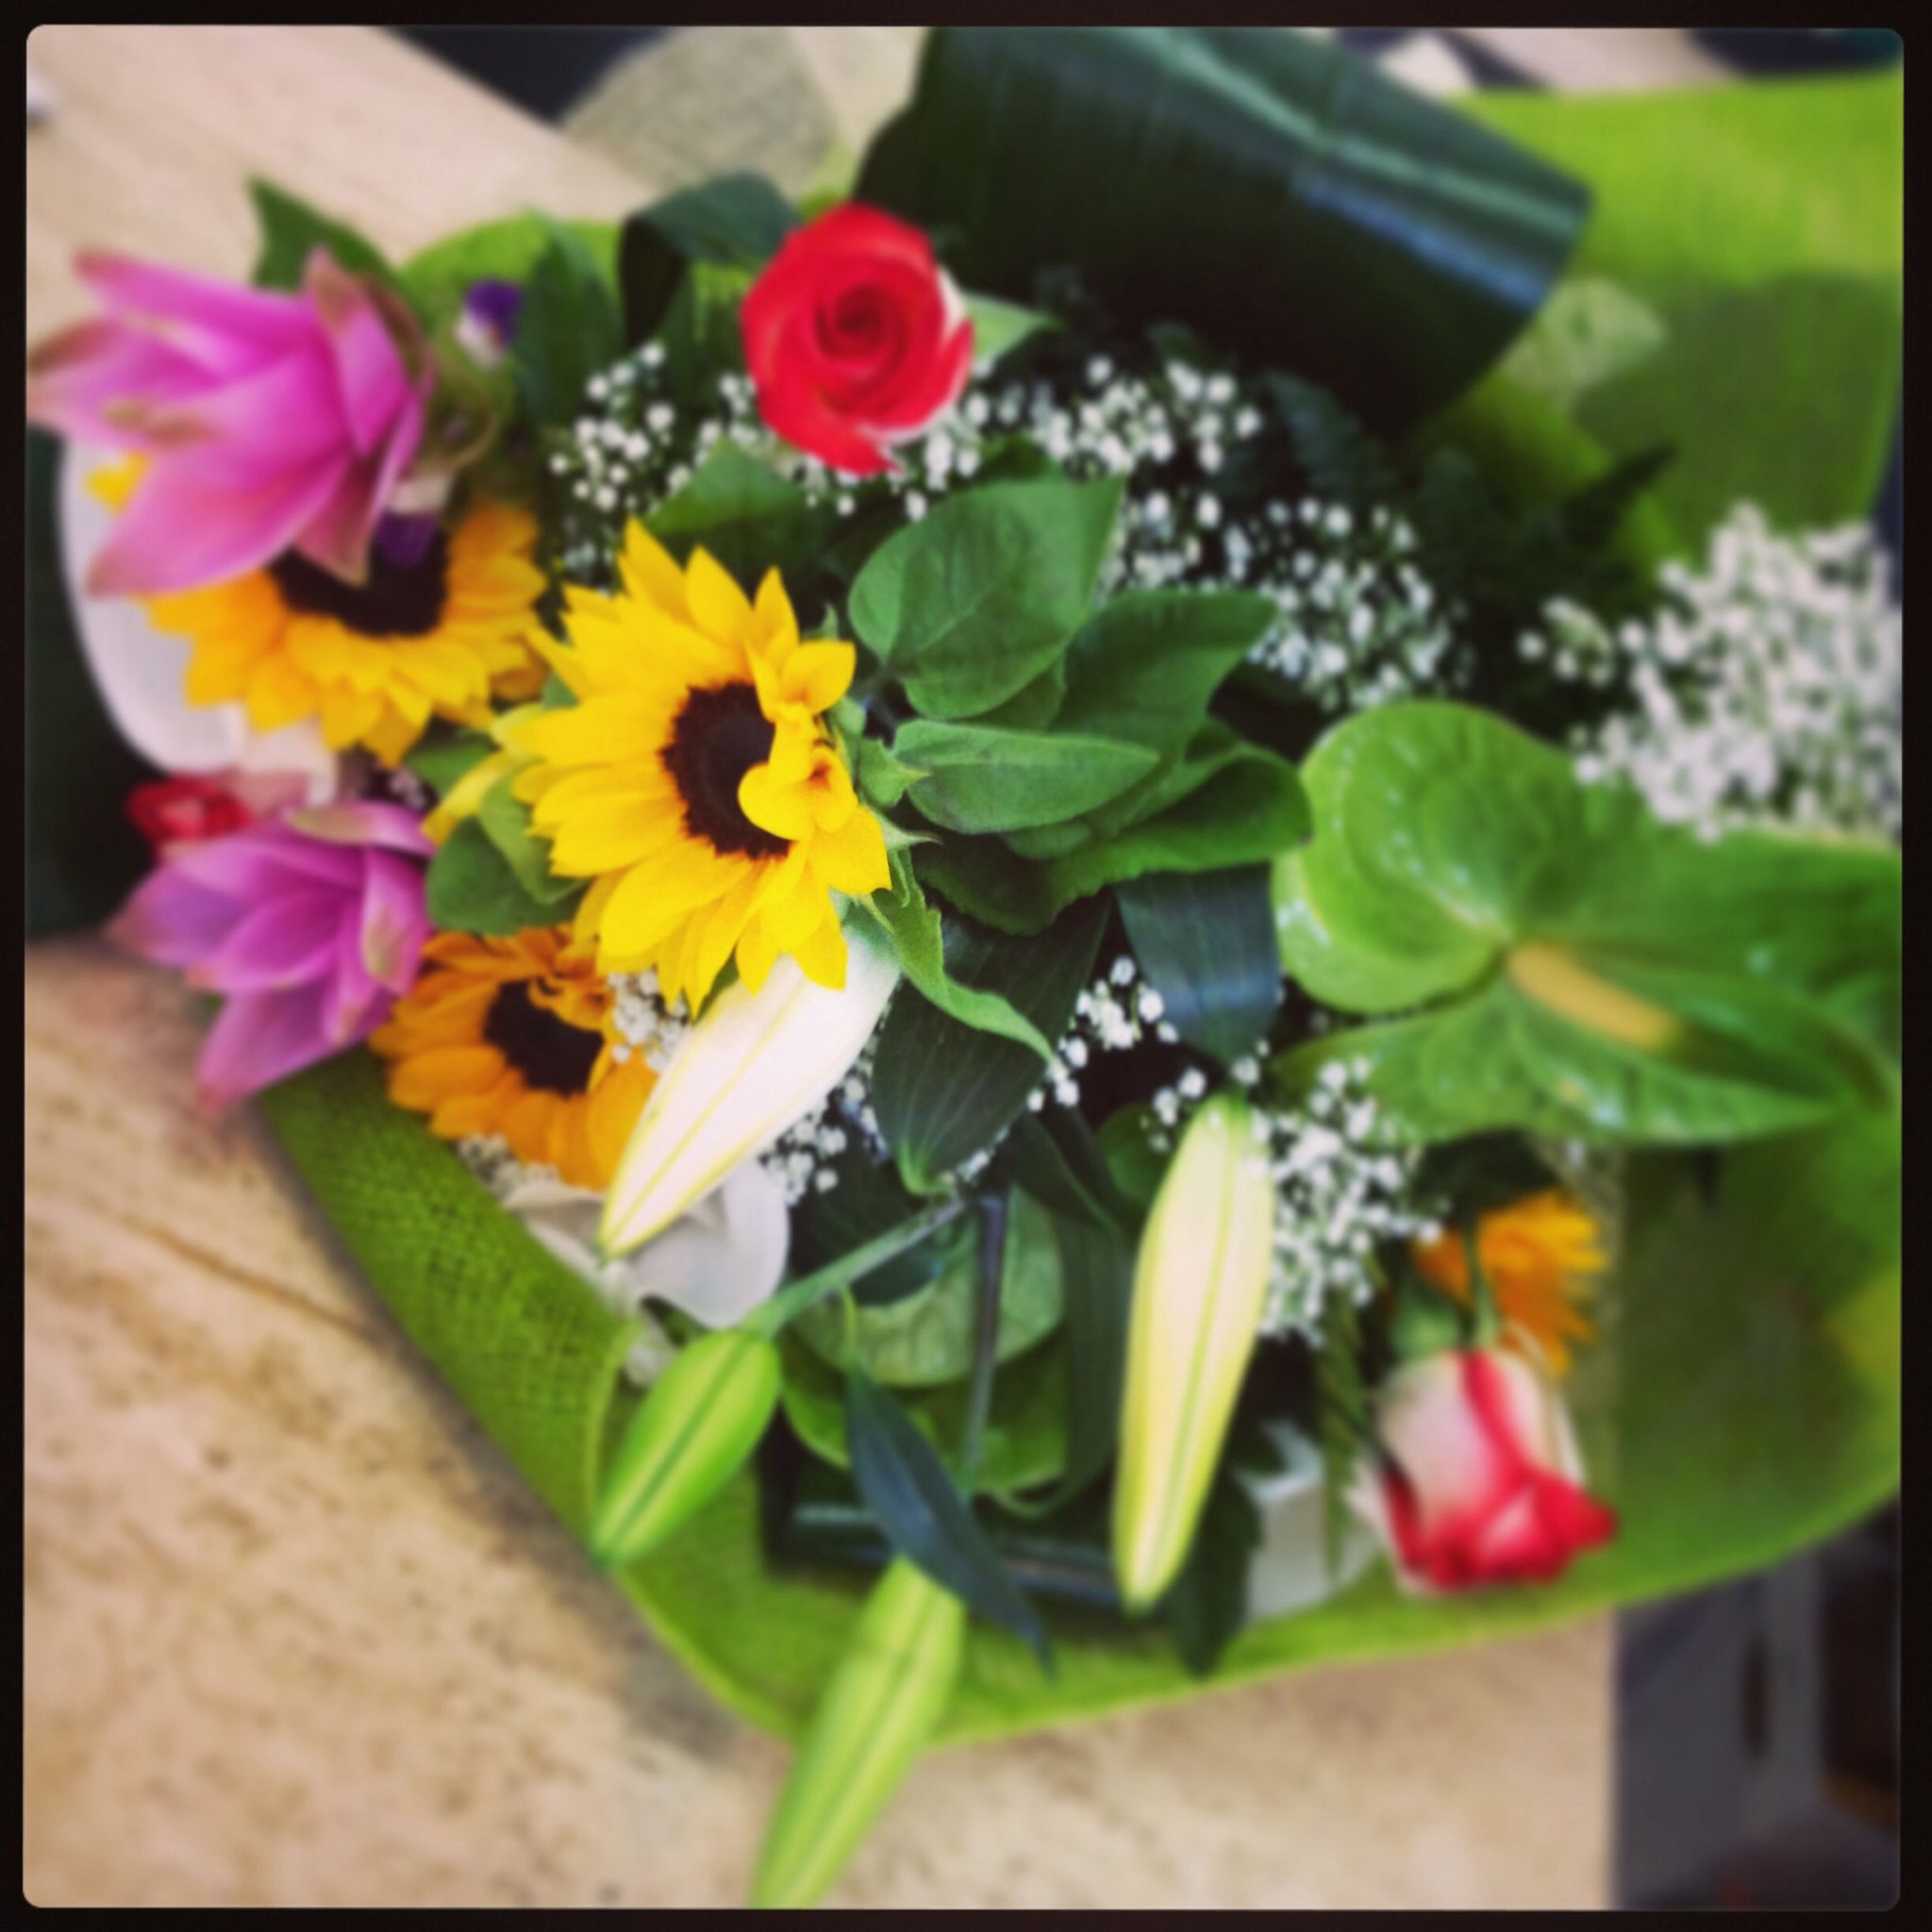 Bouquet Di Fiori Misti Per Compleanno Con Girasoli Rose Curcuma Lilium E Anturium Fiori Bouquet Di Fiori Girasoli